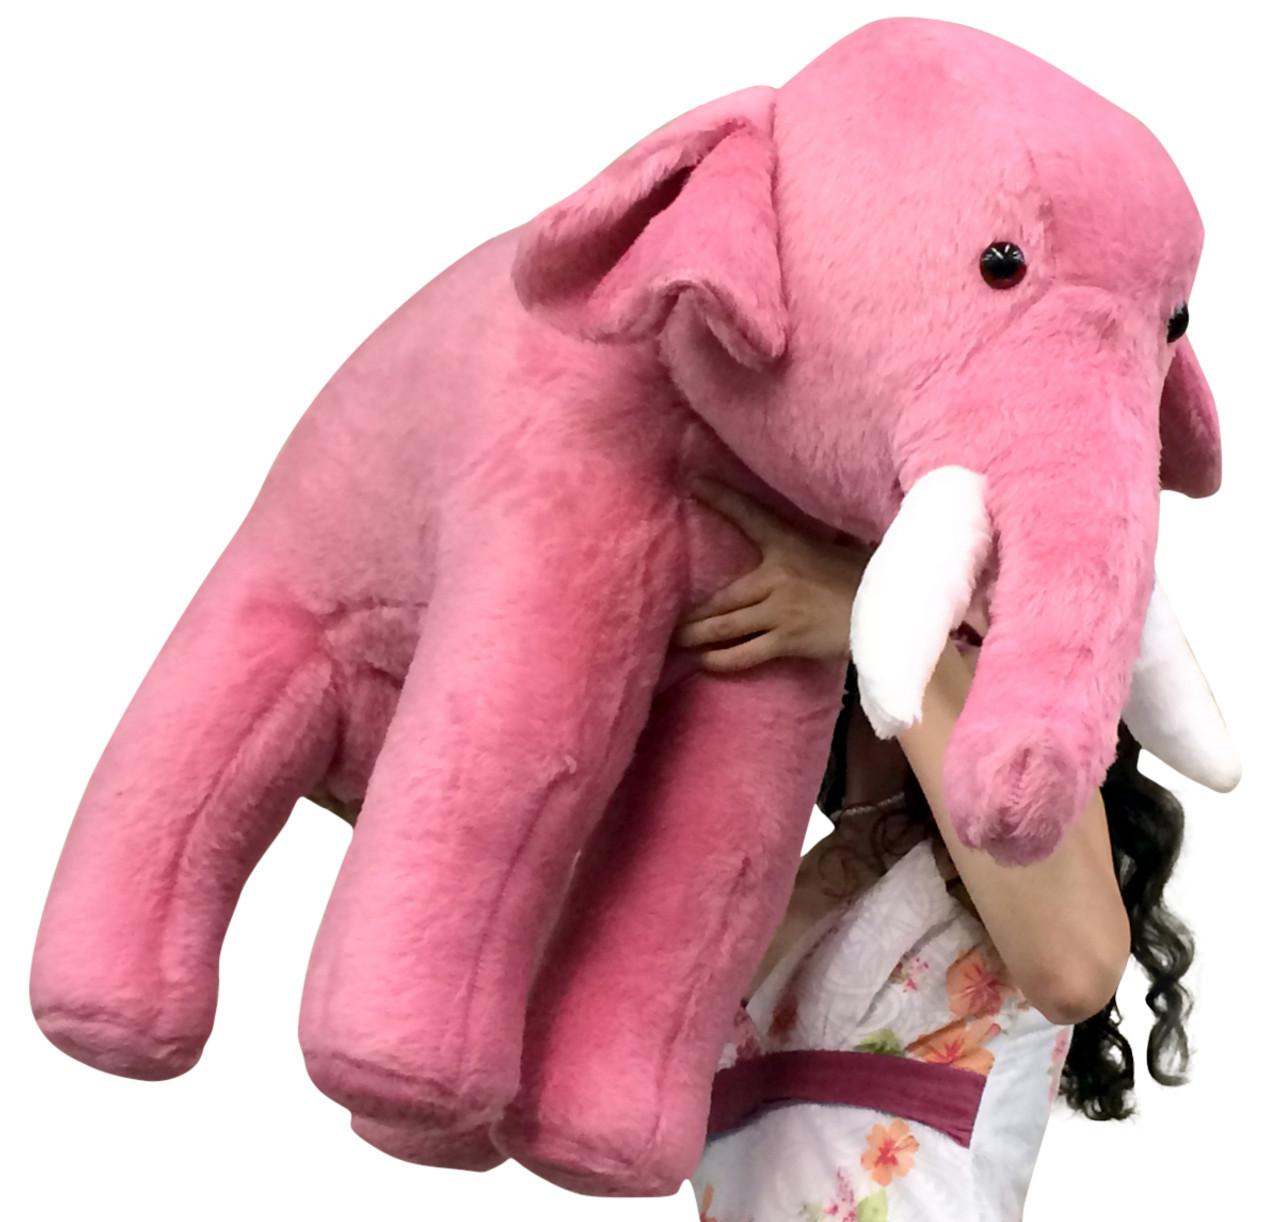 American Made Giant Stuffed Pink Elephant 3 Feet Long Soft Large